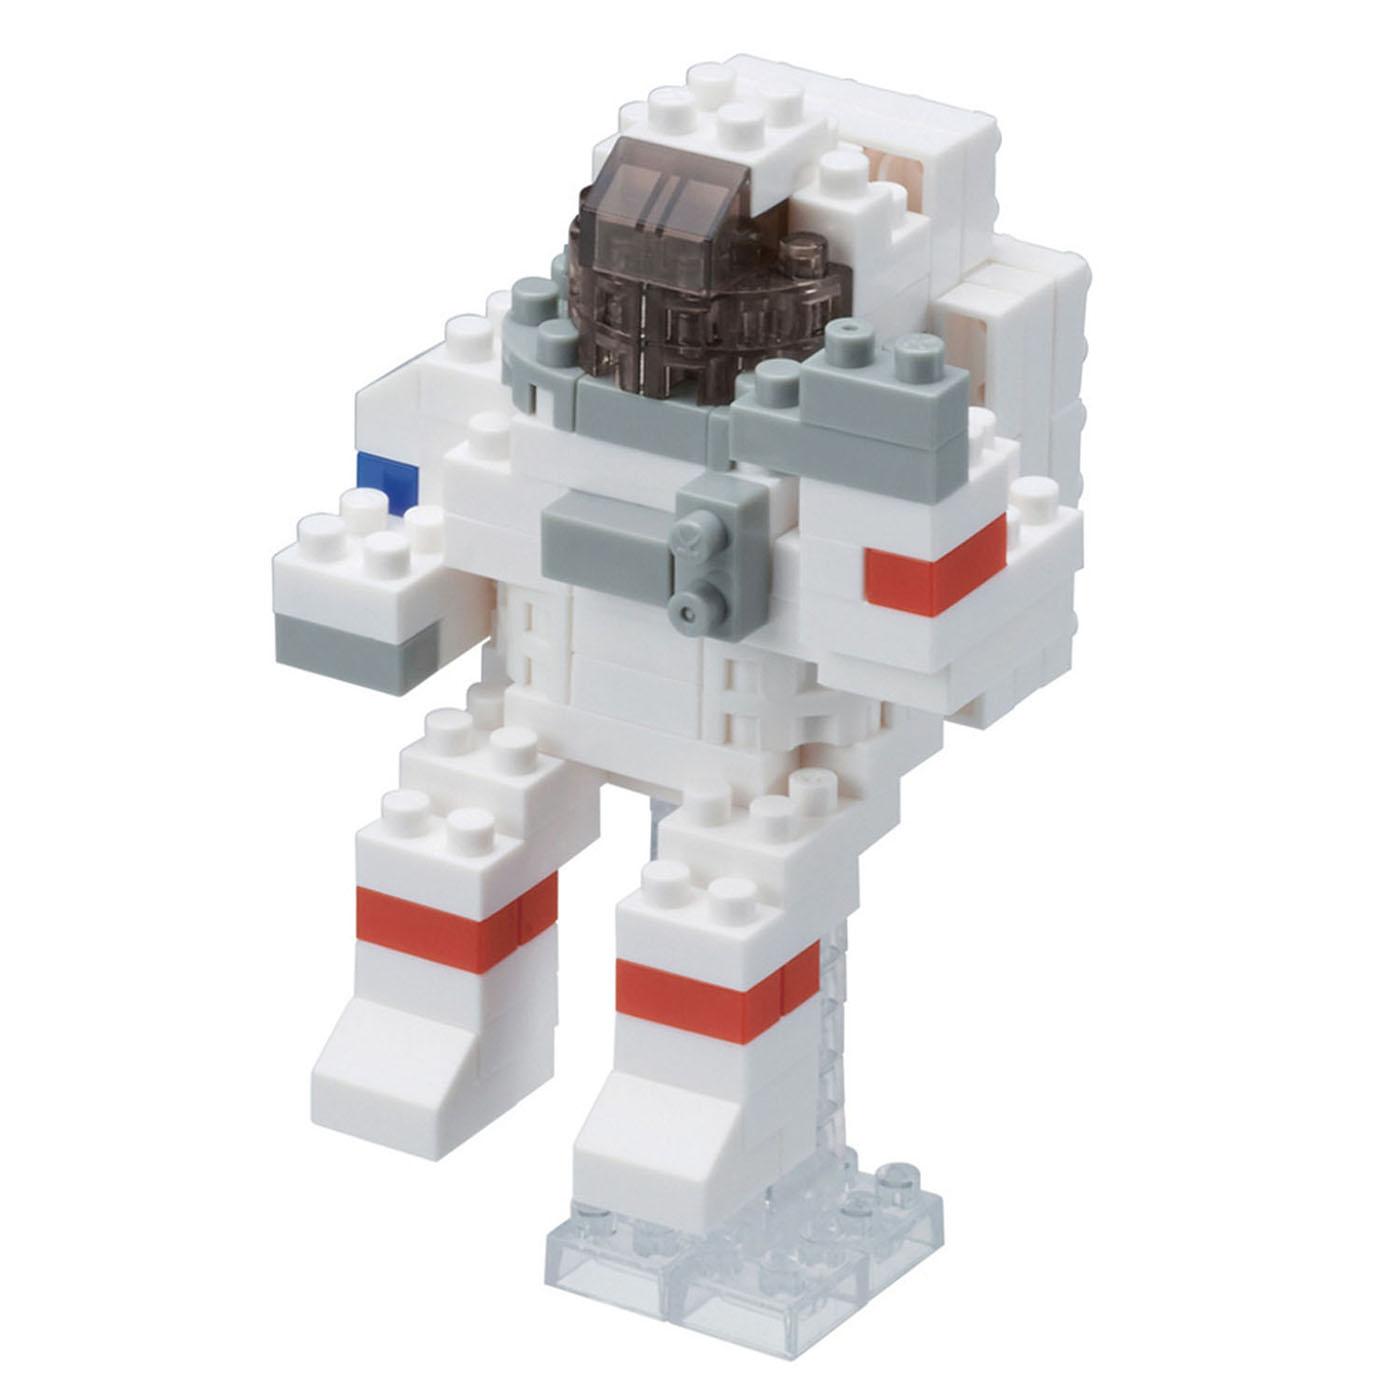 Astronaut - Nanoblock